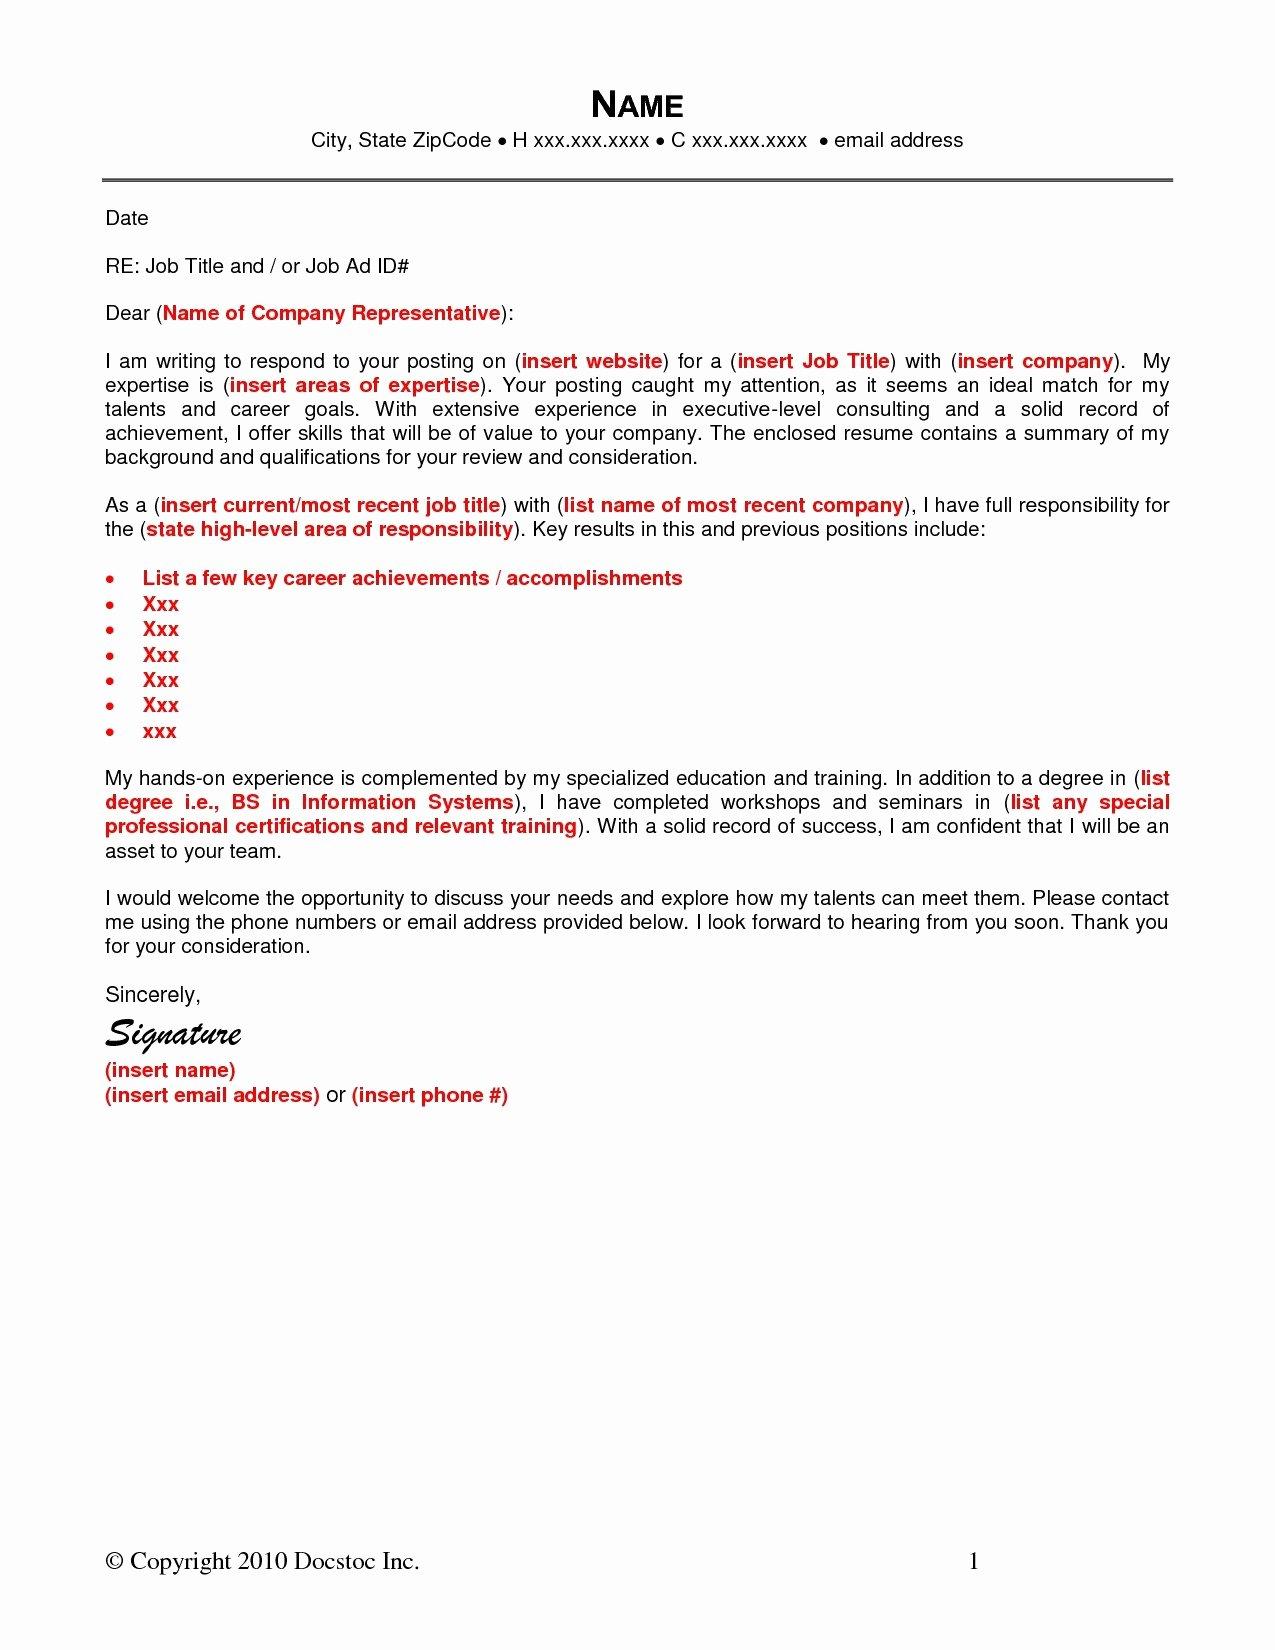 resume cover letter via email sample